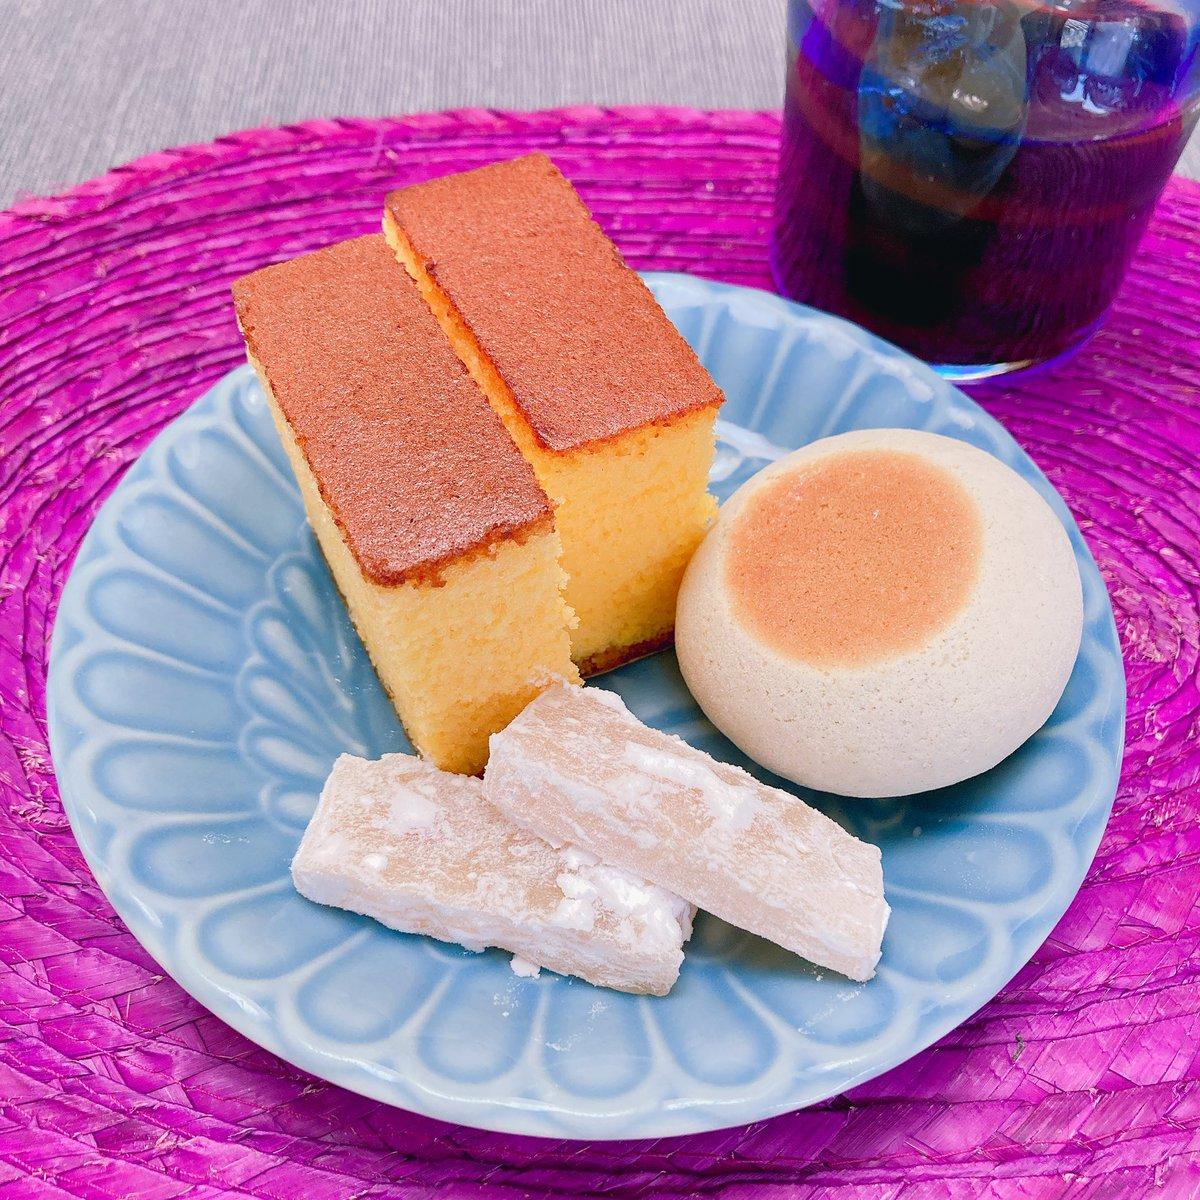 test ツイッターメディア - お昼代わりの甘いものもぐもぐ。カステラは松翁軒の普通のとレモンの。一口香と、レモンの朝鮮飴。 今日まで楽しむ日。 明日から水断食😬 https://t.co/Tlu92epwSN